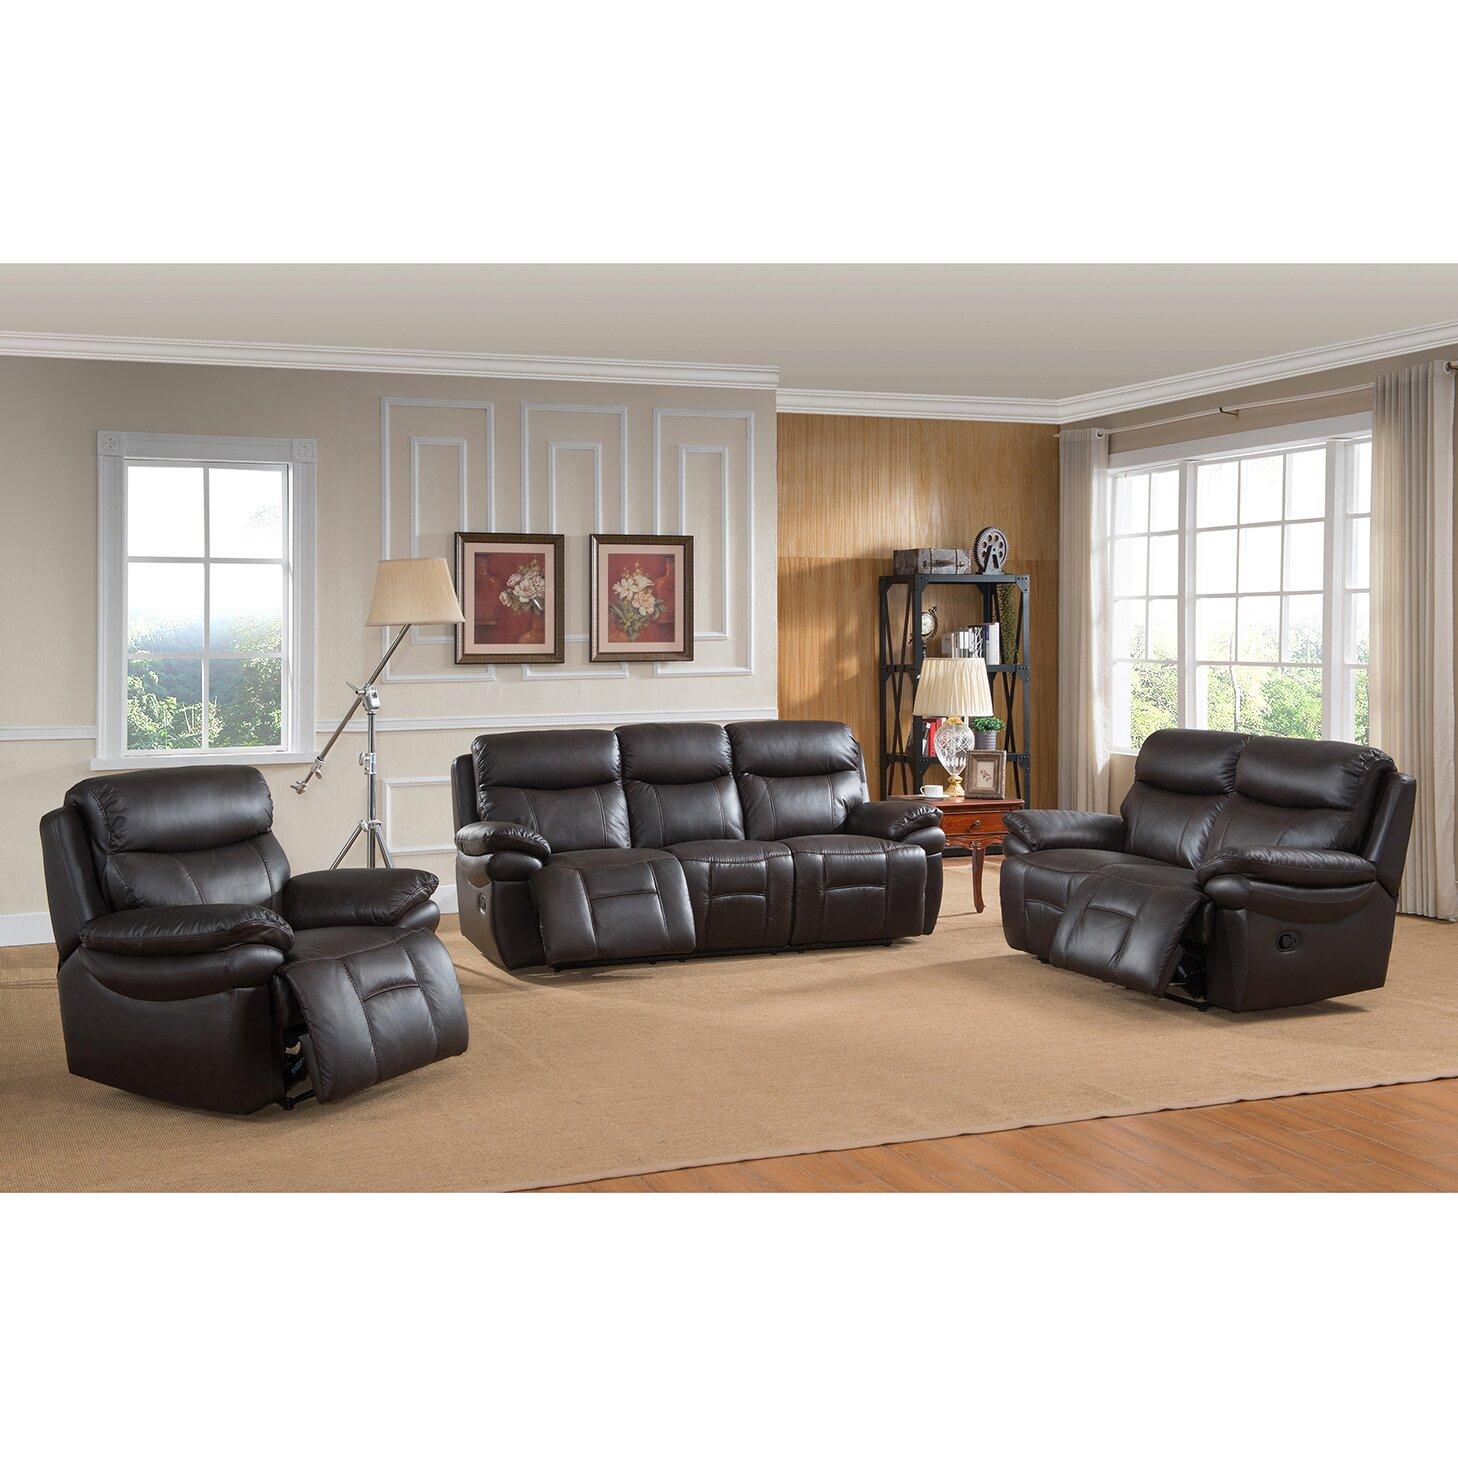 amax rushmore 3 piece leather living room set reviews wayfair. Black Bedroom Furniture Sets. Home Design Ideas